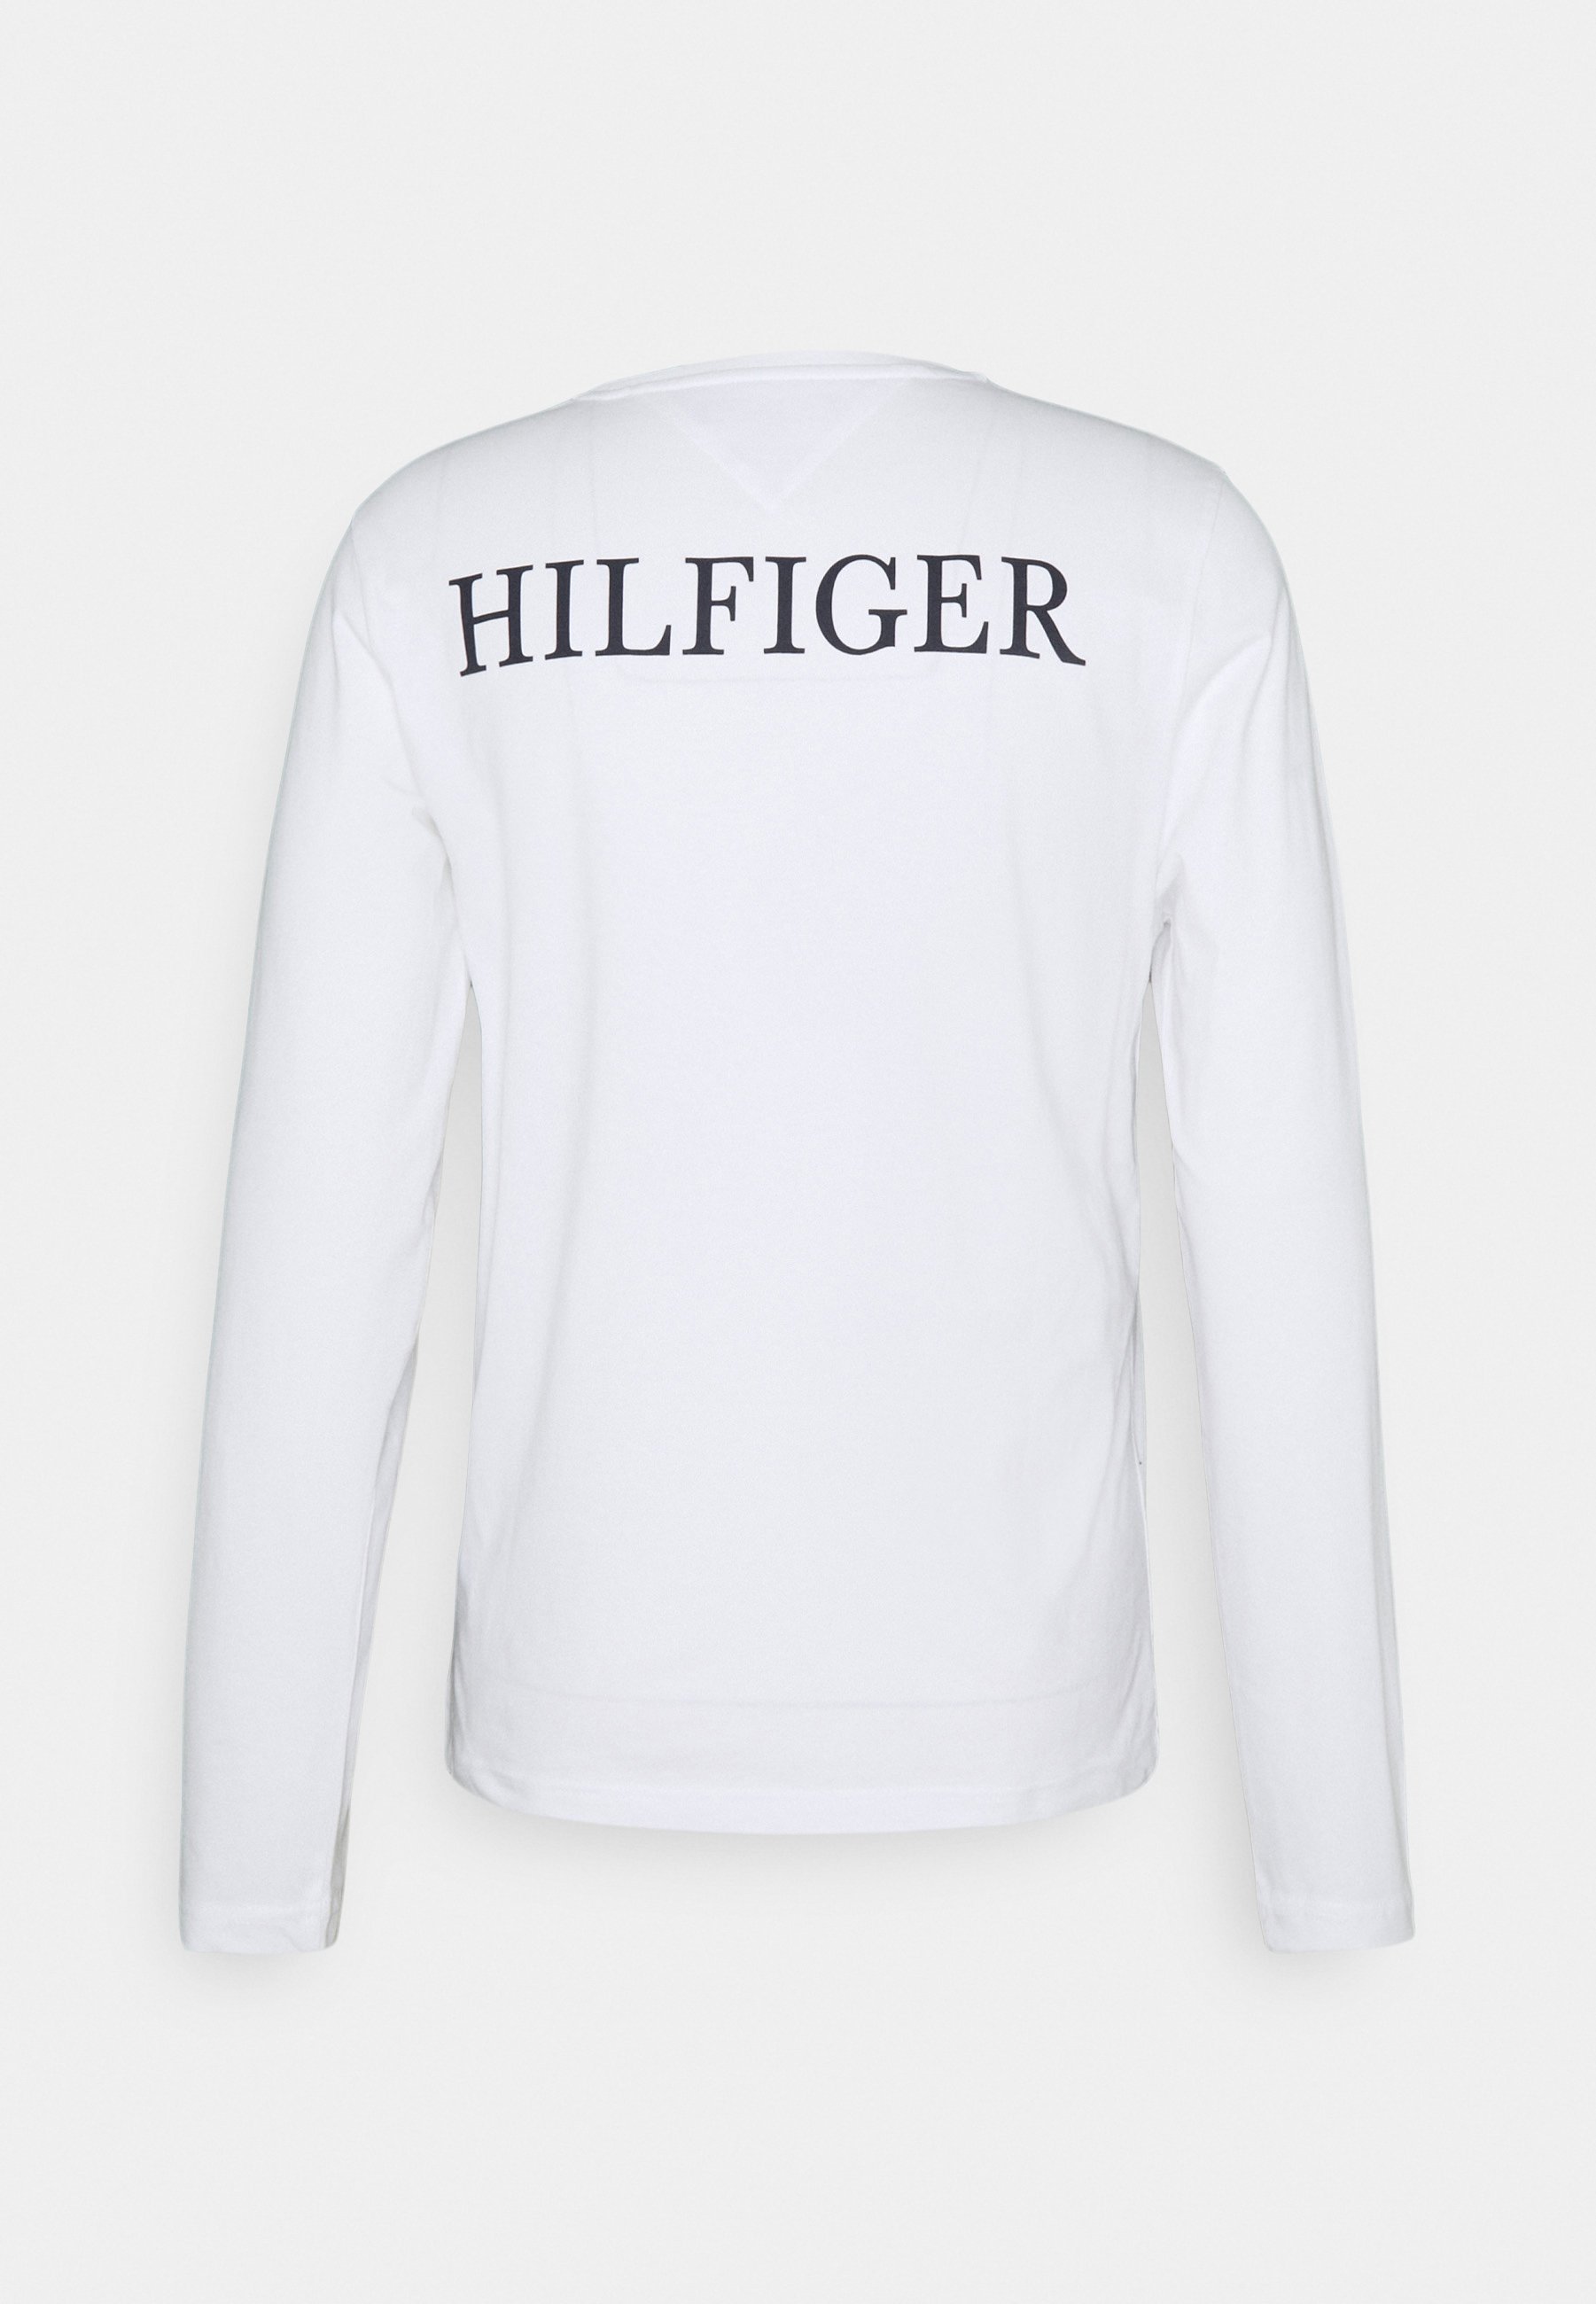 Uomo LOGO ON BACK TEE - Maglietta a manica lunga